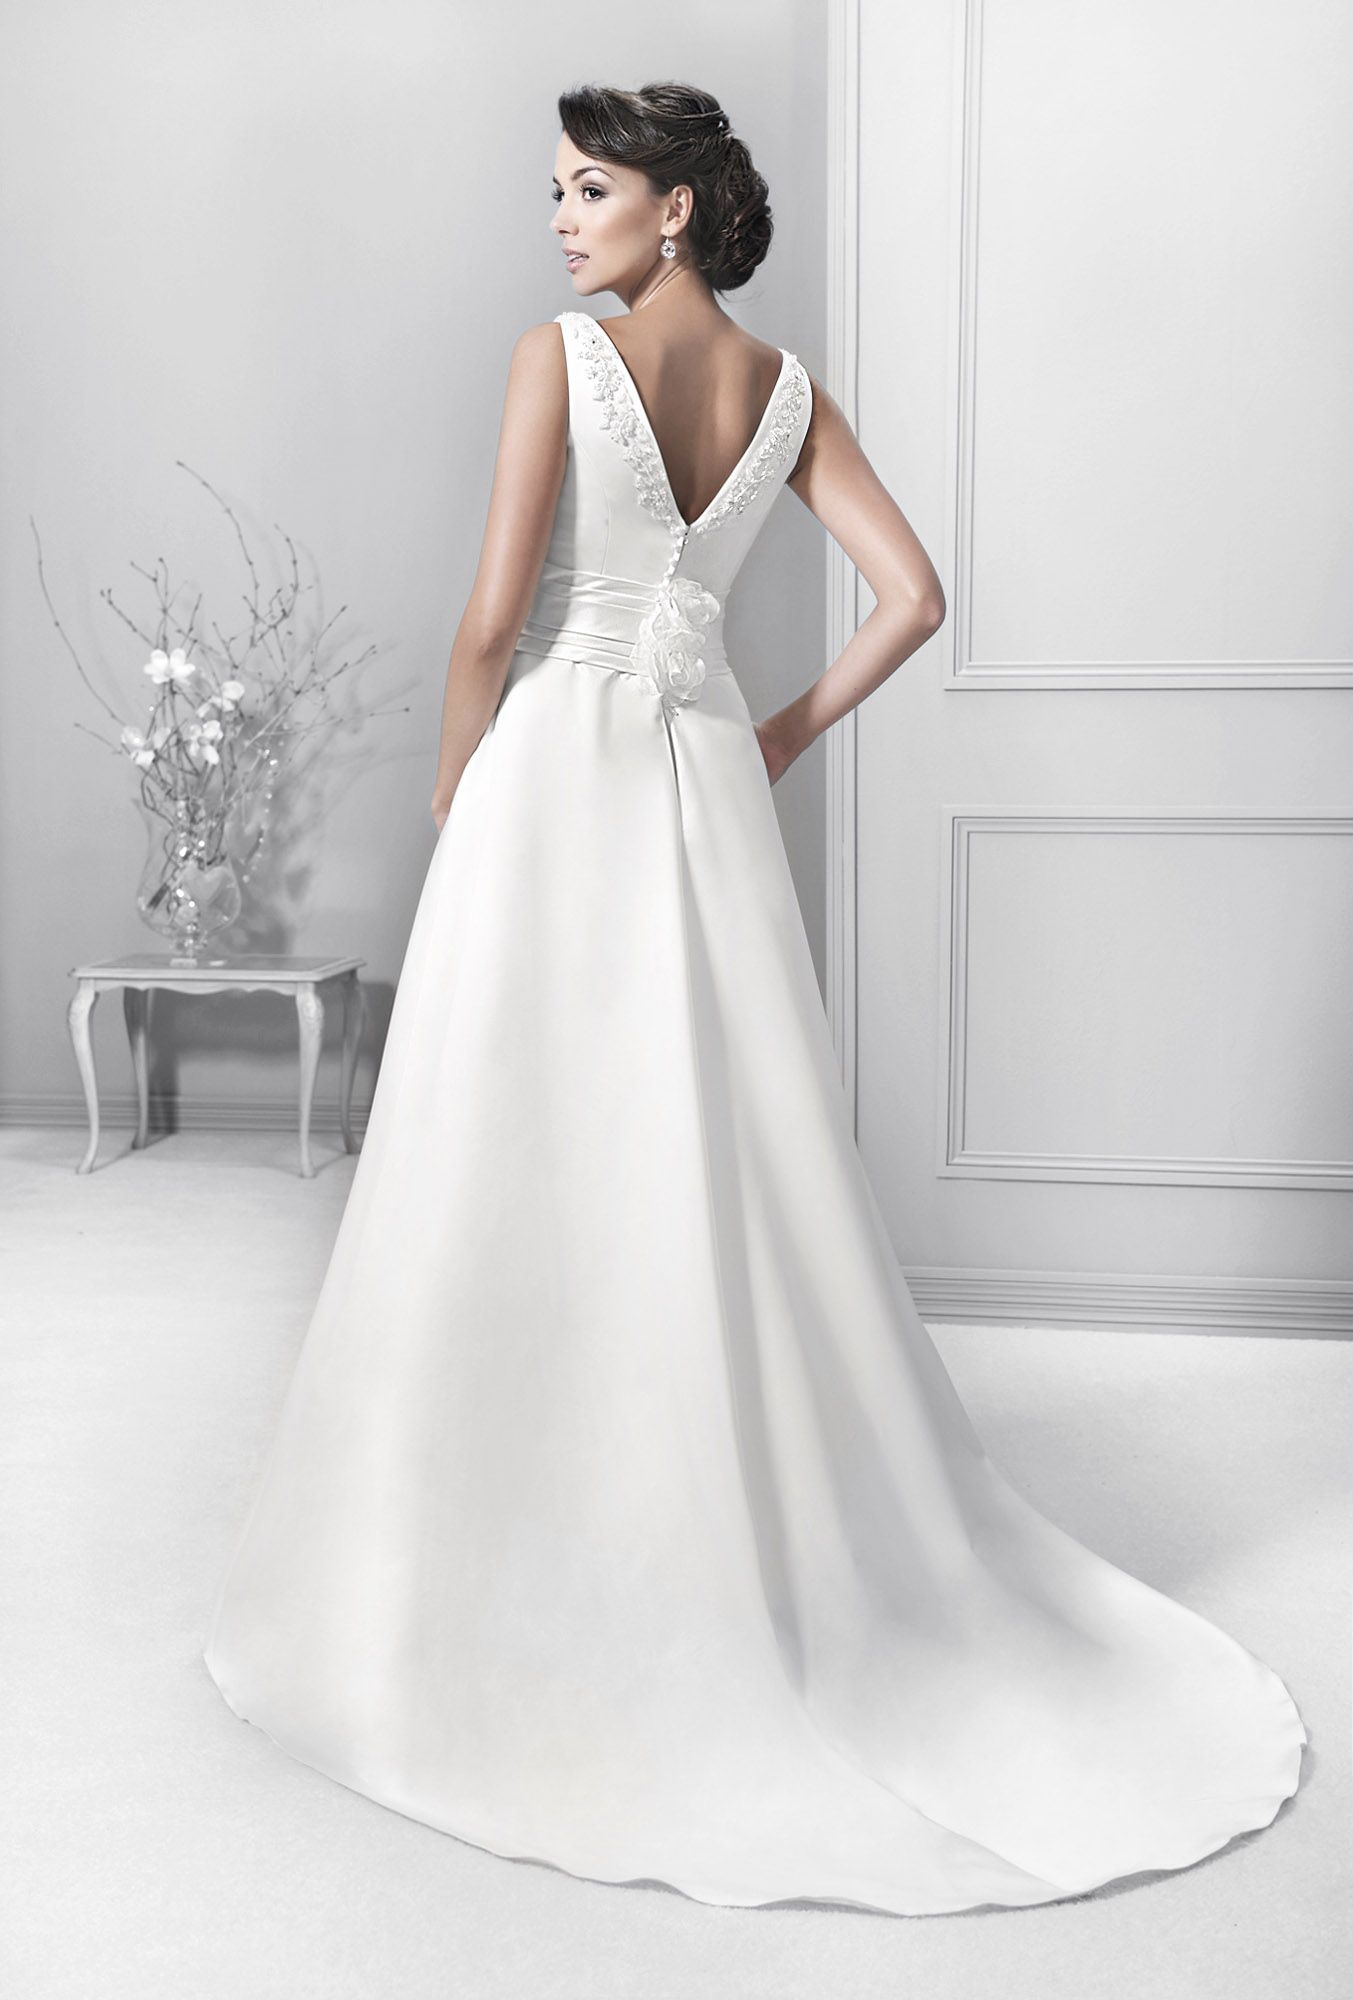 6dcbc14b43 Crystal Collection - Agnes - koronkowe suknie ślubne